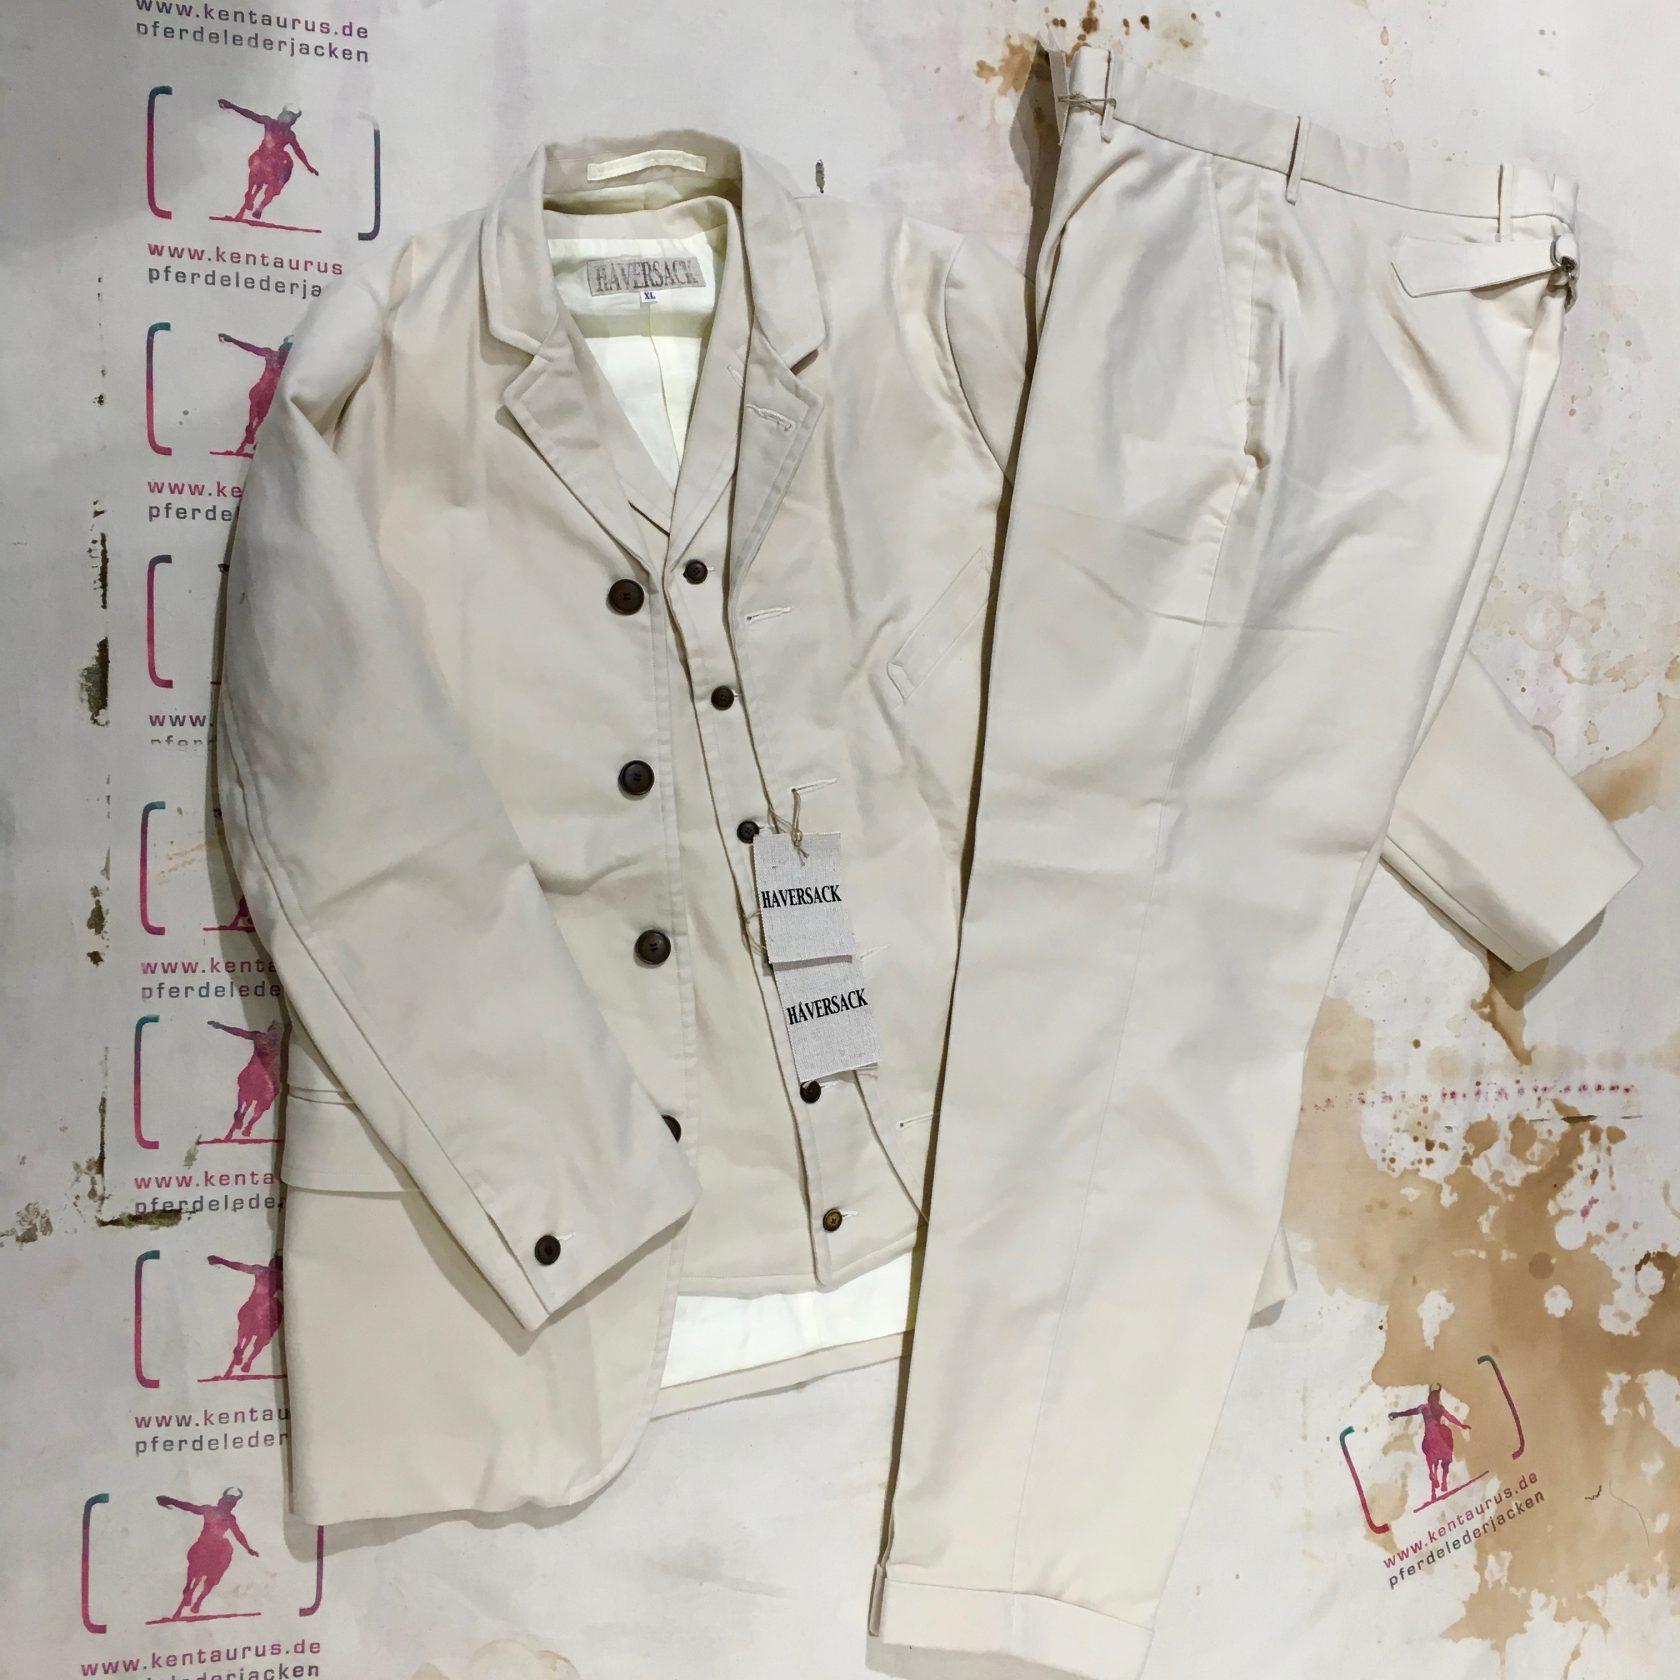 Haversack white moleskin 3 piece suit